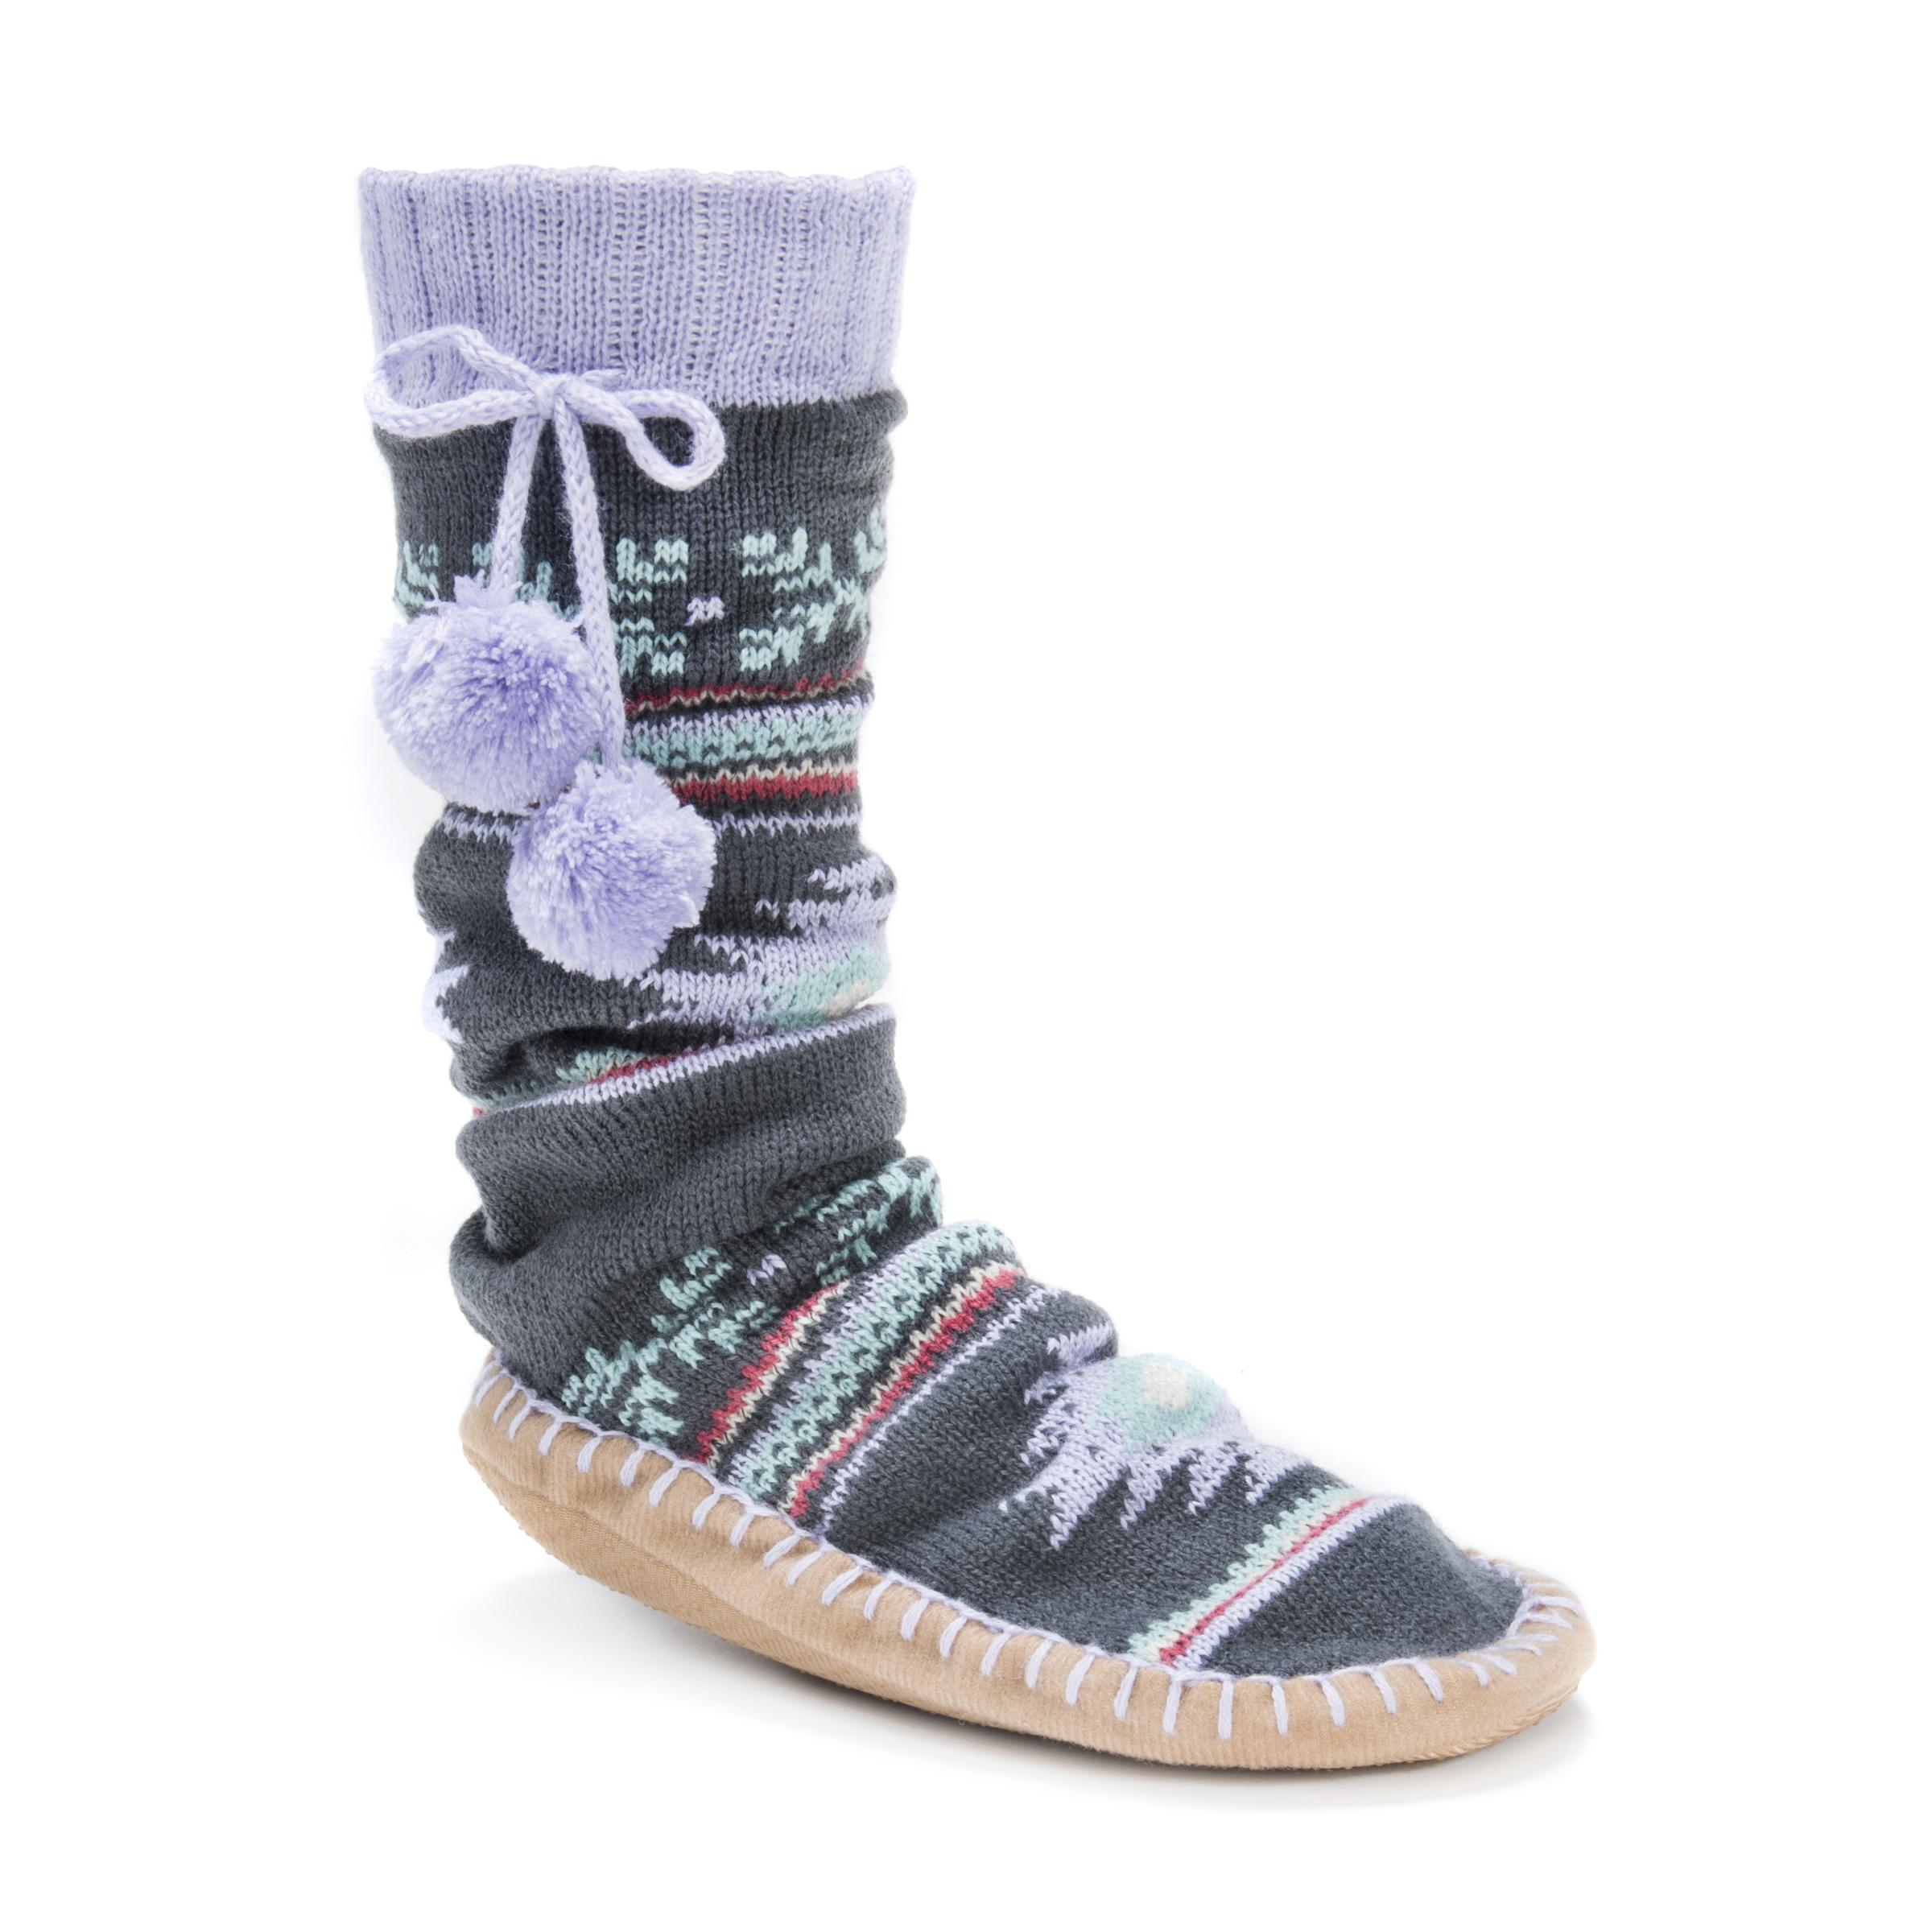 MUK LUKS® Women's Slipper Socks with Poms – Sweet Pea | Slippers.com - Shop  Comfy